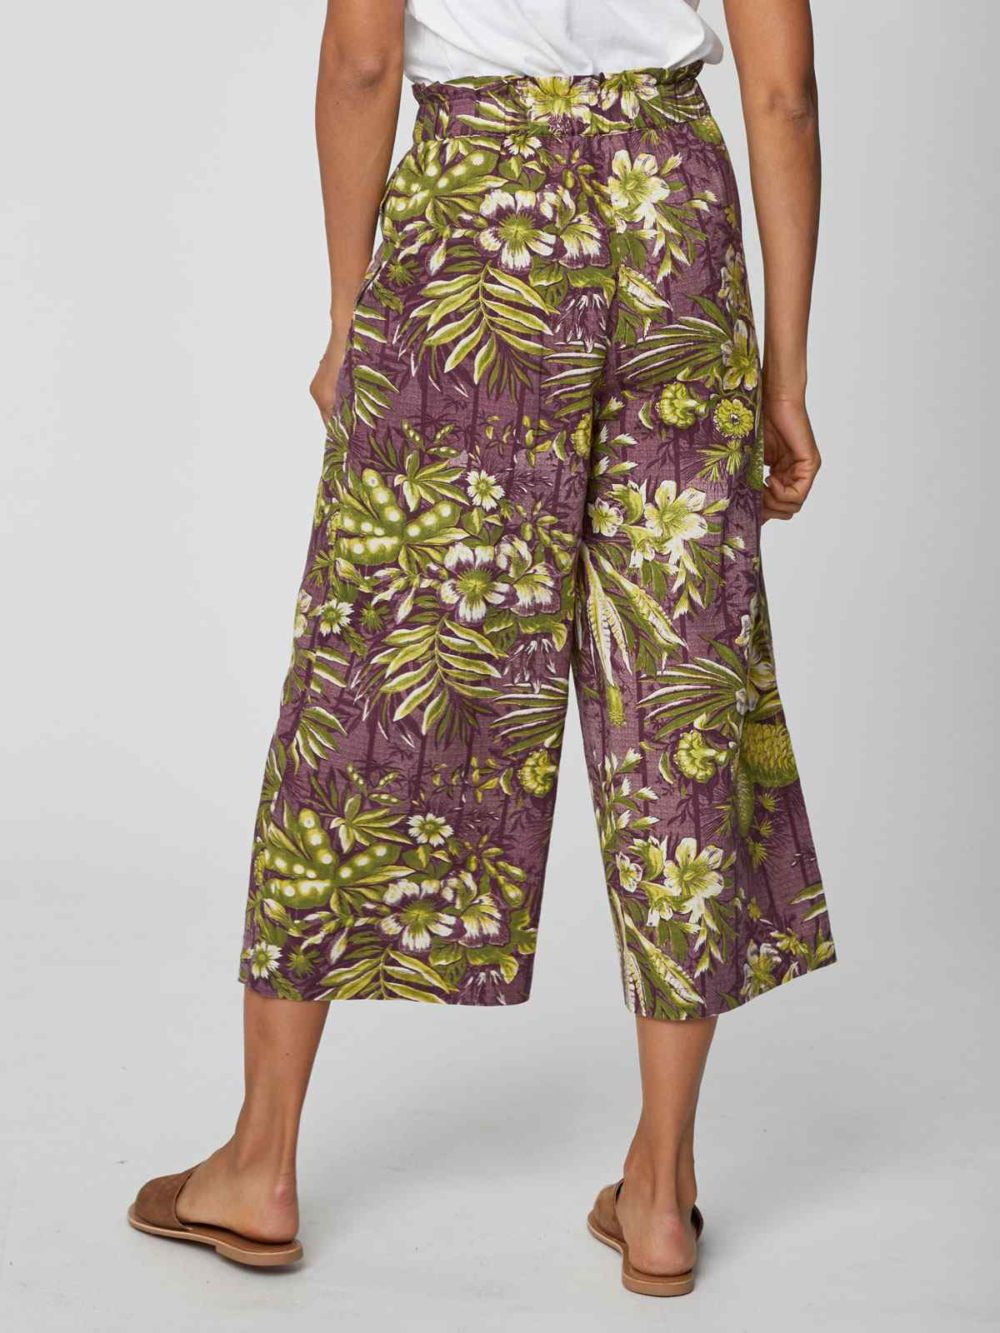 Tesari Culottes Thought Clothing Katie Kerr Women's Clothing